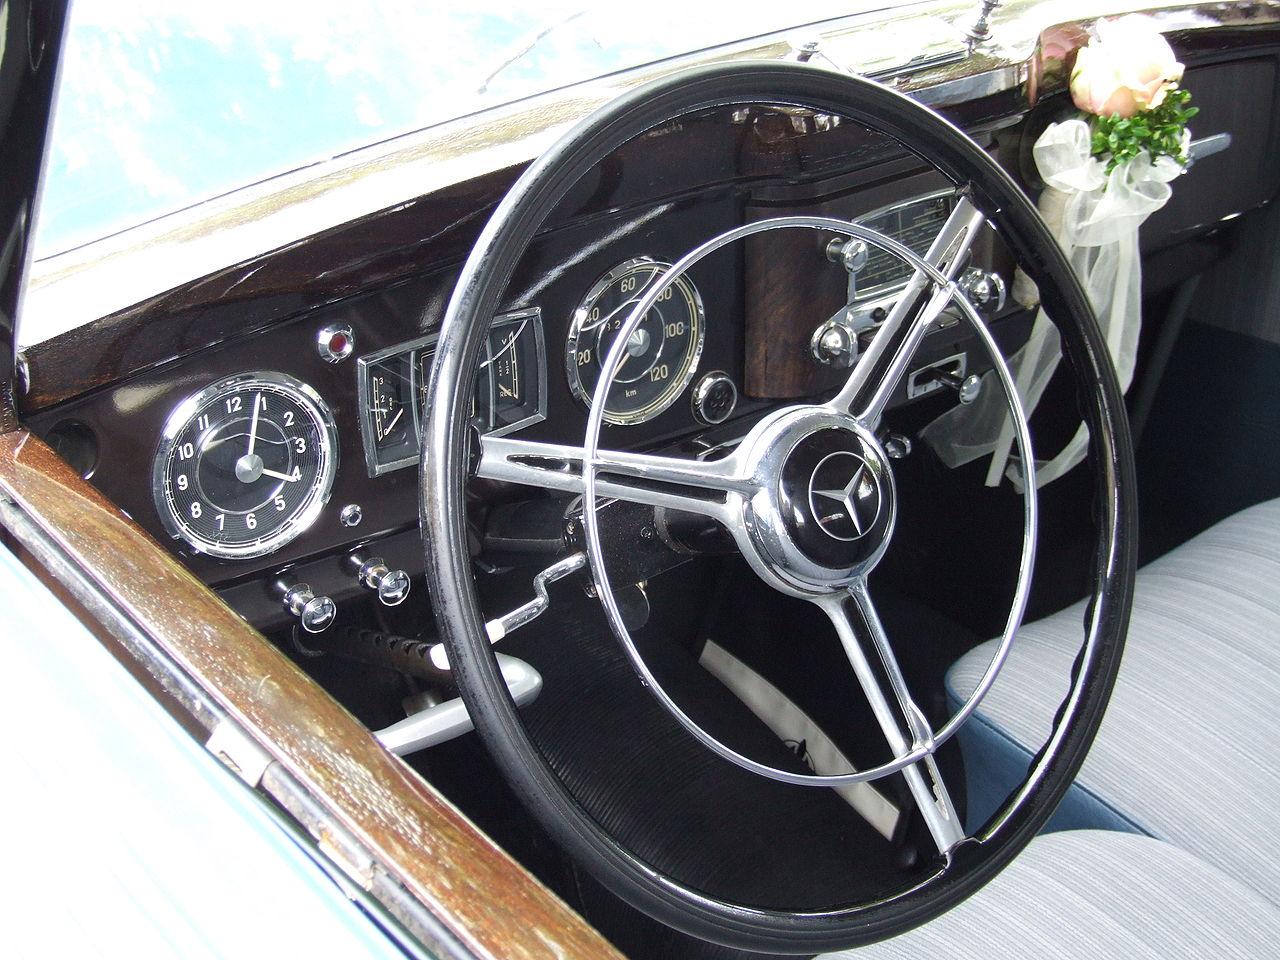 File:Mercedes 170 DS Armaturenbrett.JPG - Wikimedia Commons | {Armaturenbrett mercedes 20}